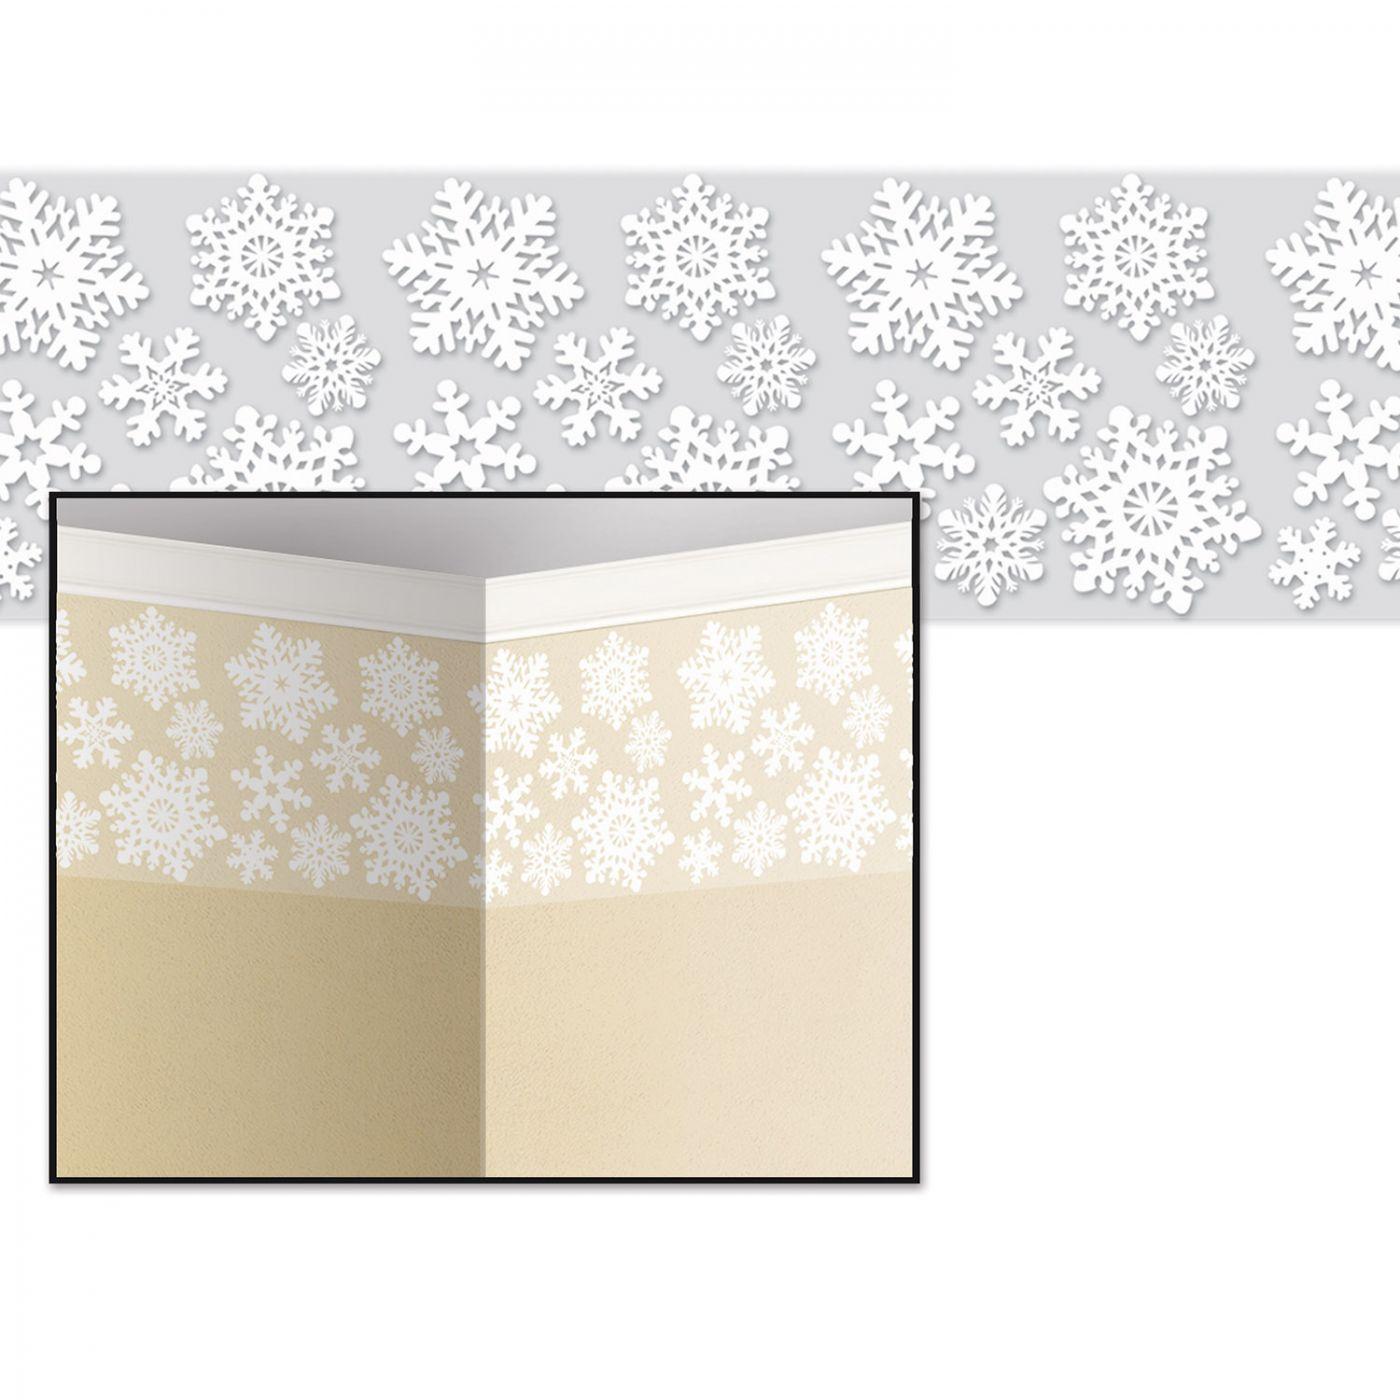 Snowflake Border (6) image